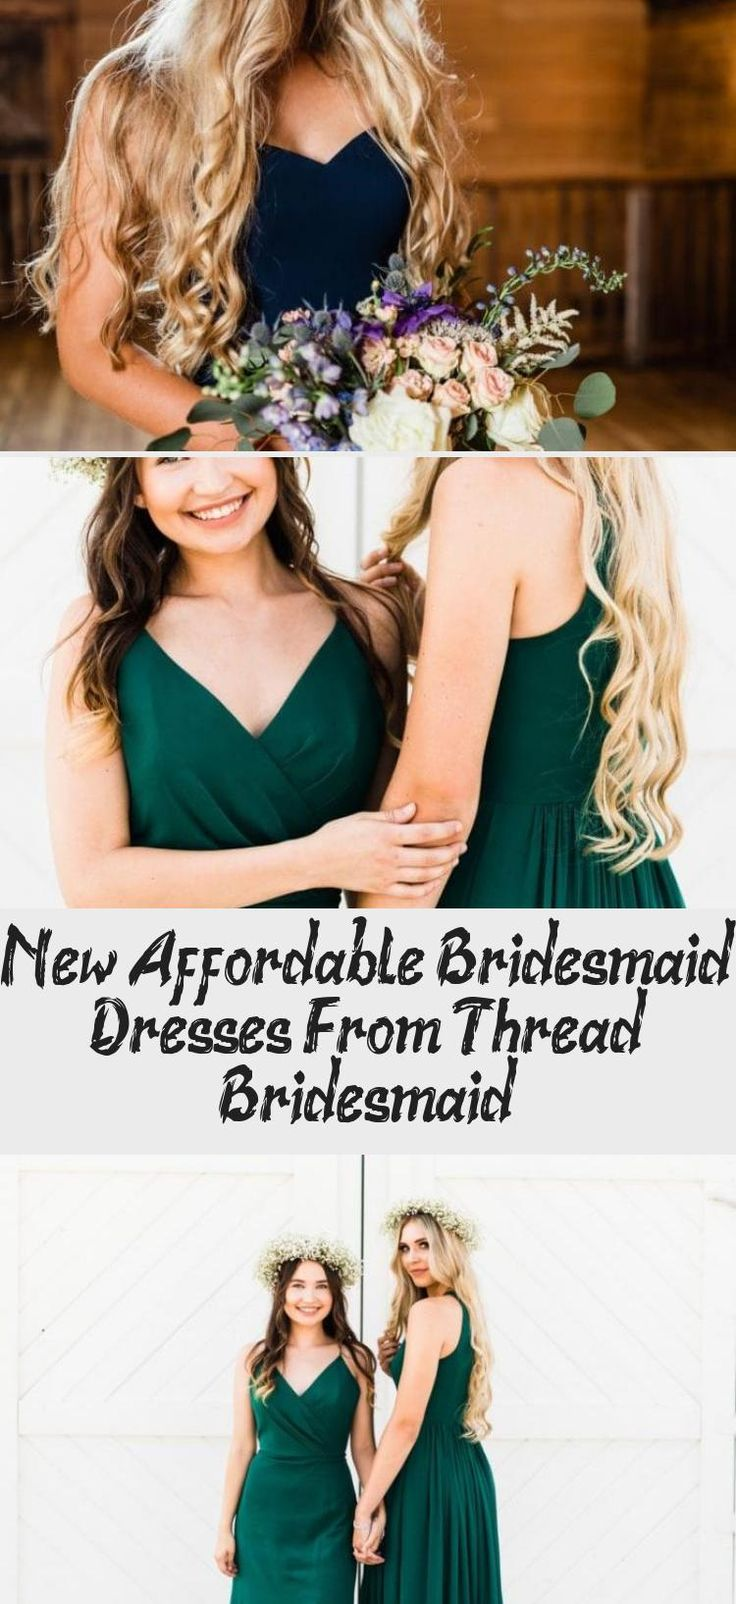 Light blue boho style affordable dresses for bridesmaids from Thread Bridesmaid! #bridesmaids #bridesmaid #bridesmaiddresses